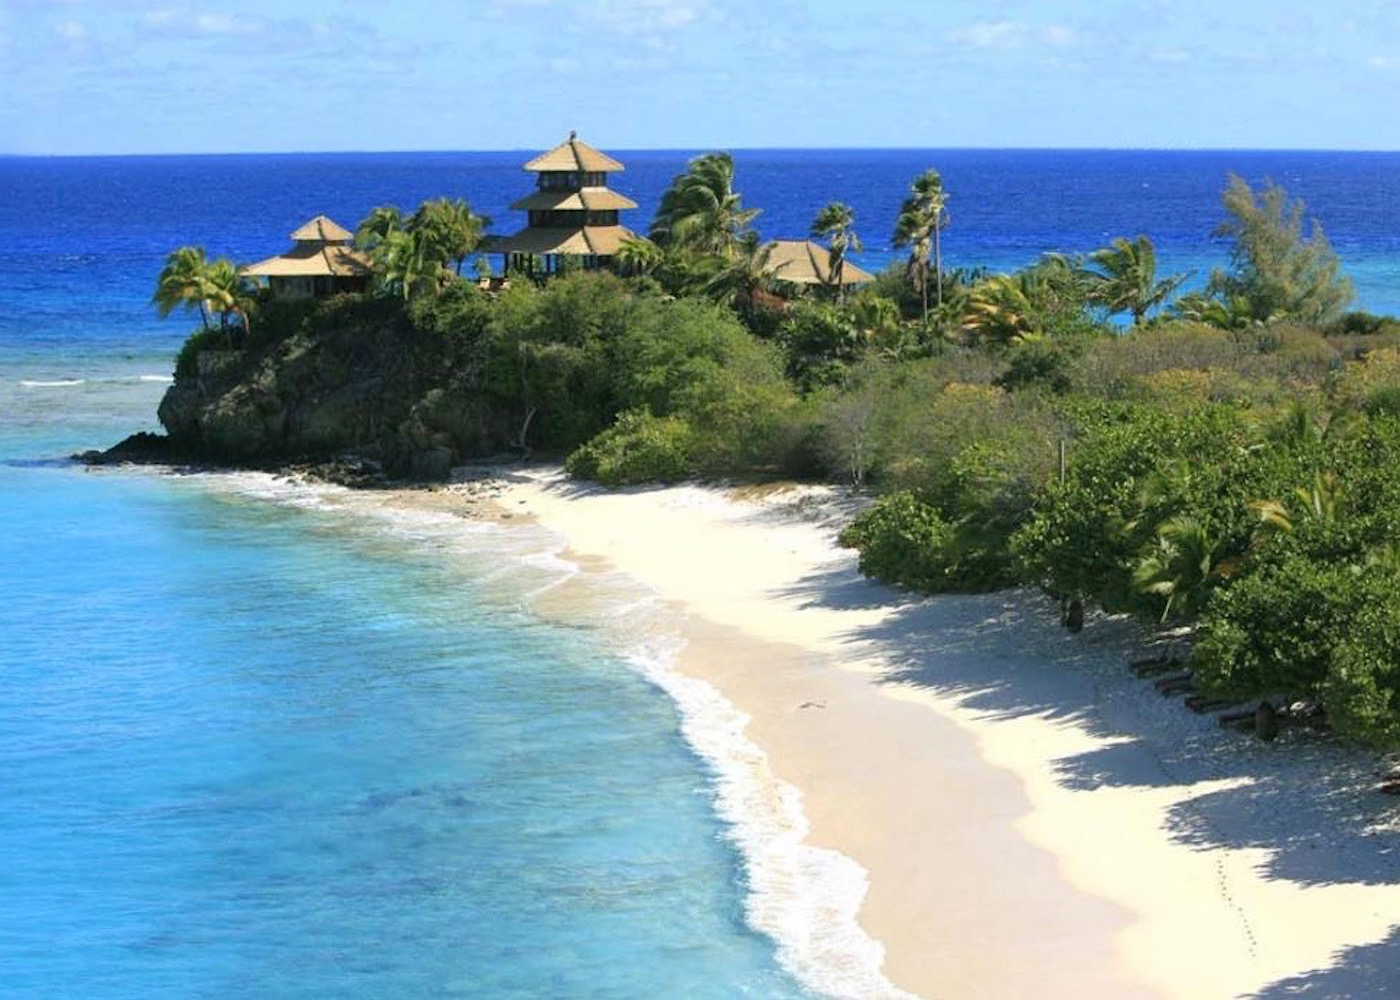 View of Pantai Pasir Beach on the East Coast of Bali, Indonesia